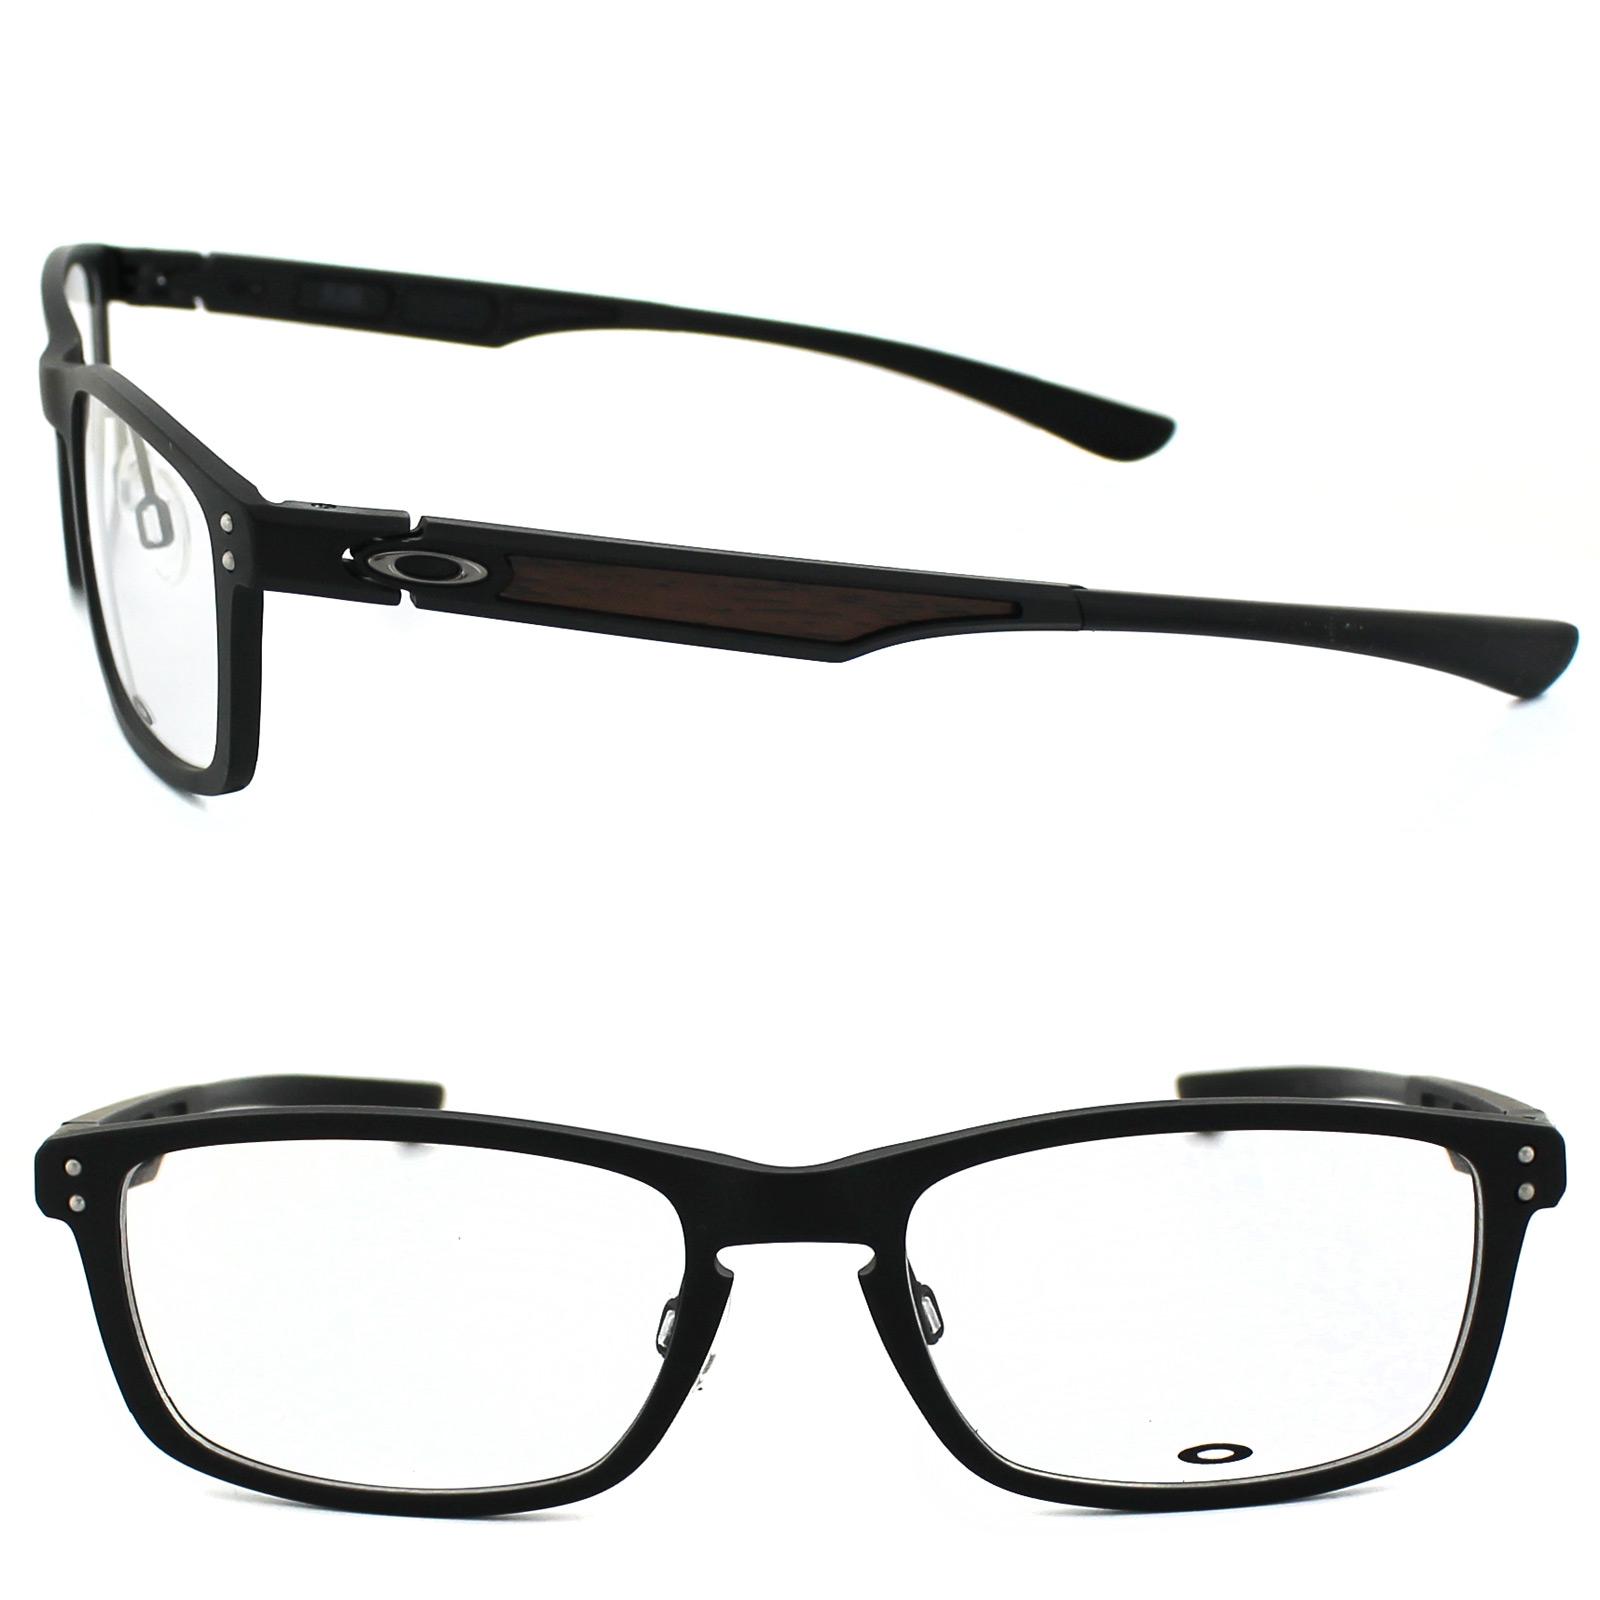 48d237e2d1 Oakley Style Plank Eyeglasses « Heritage Malta